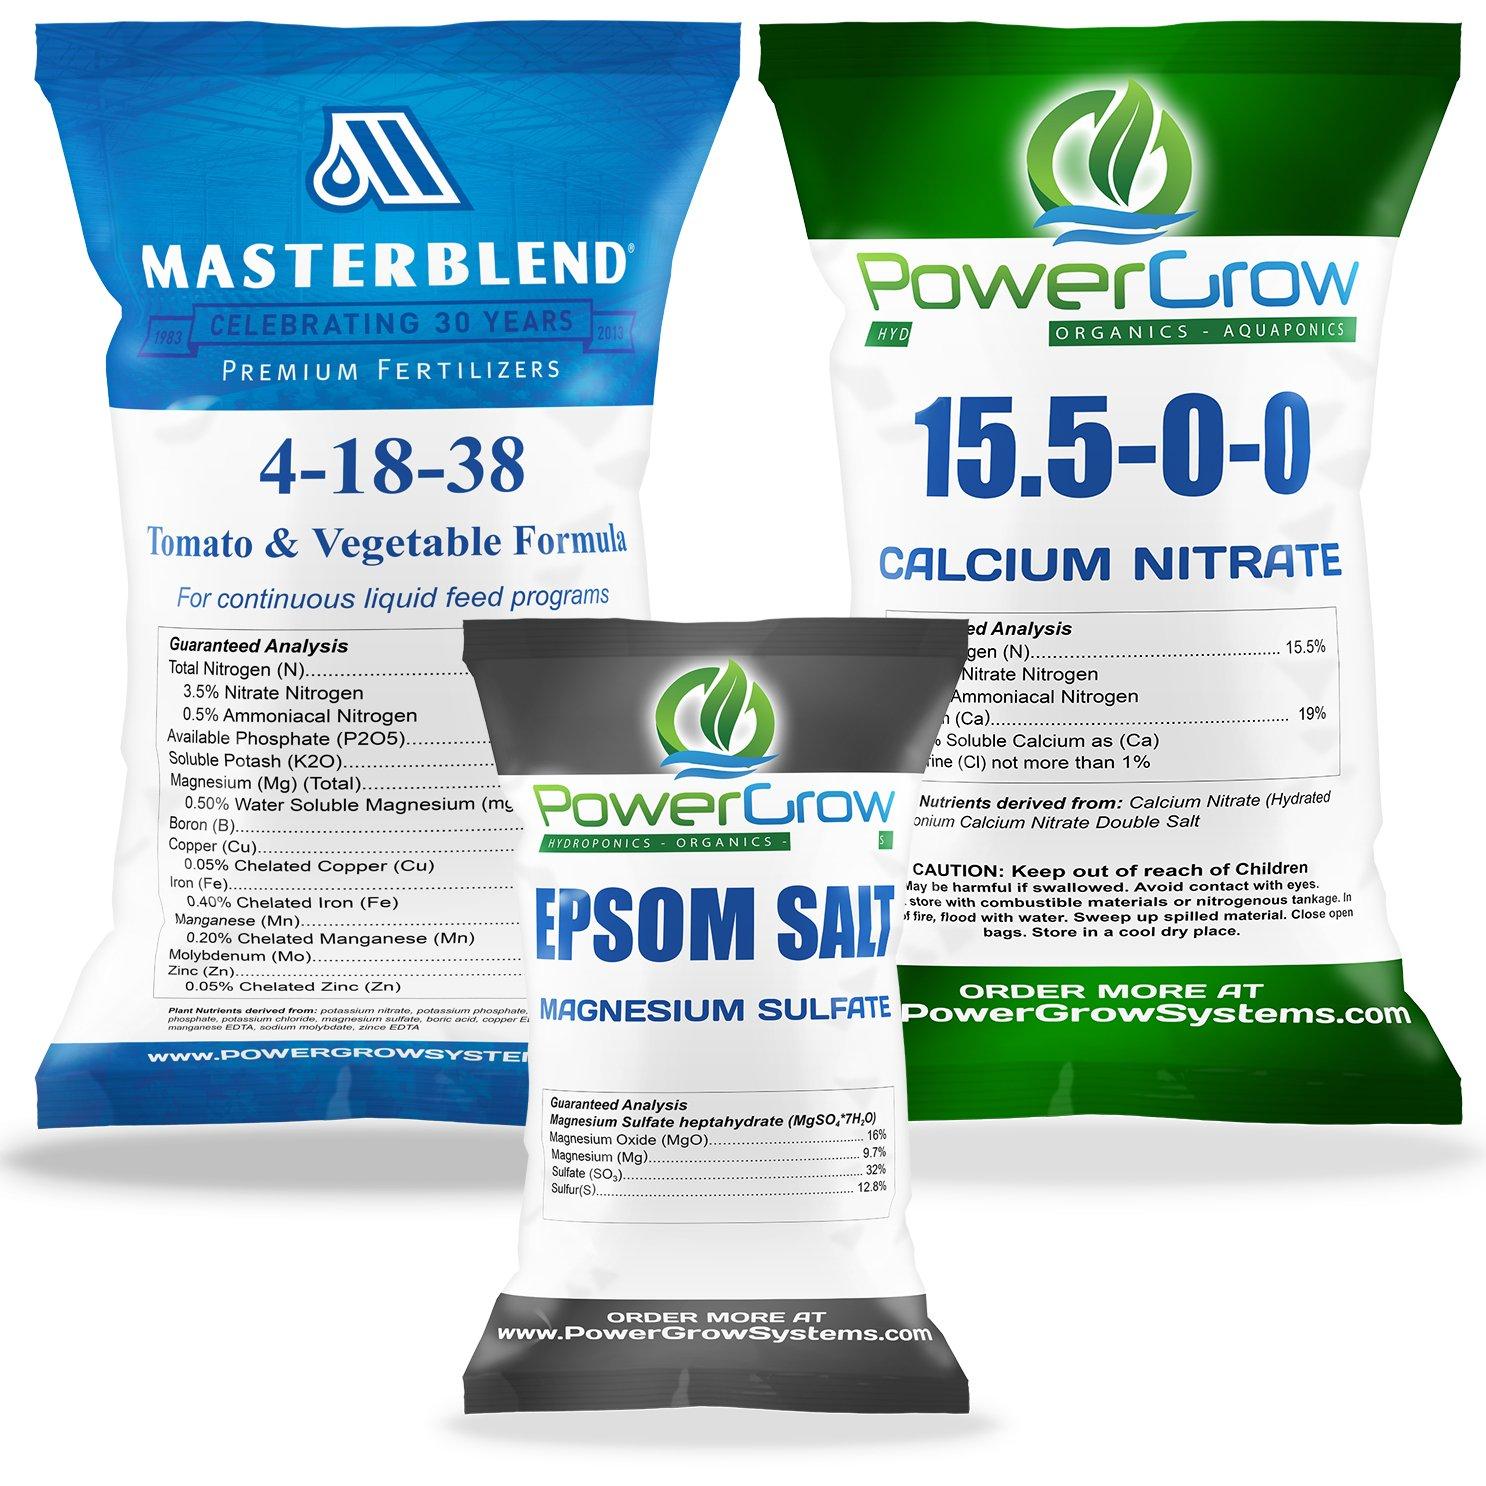 MASTERBLEND 4-18-38 Complete Combo Kit Fertilizer BULK (62.5 Pound Kit)